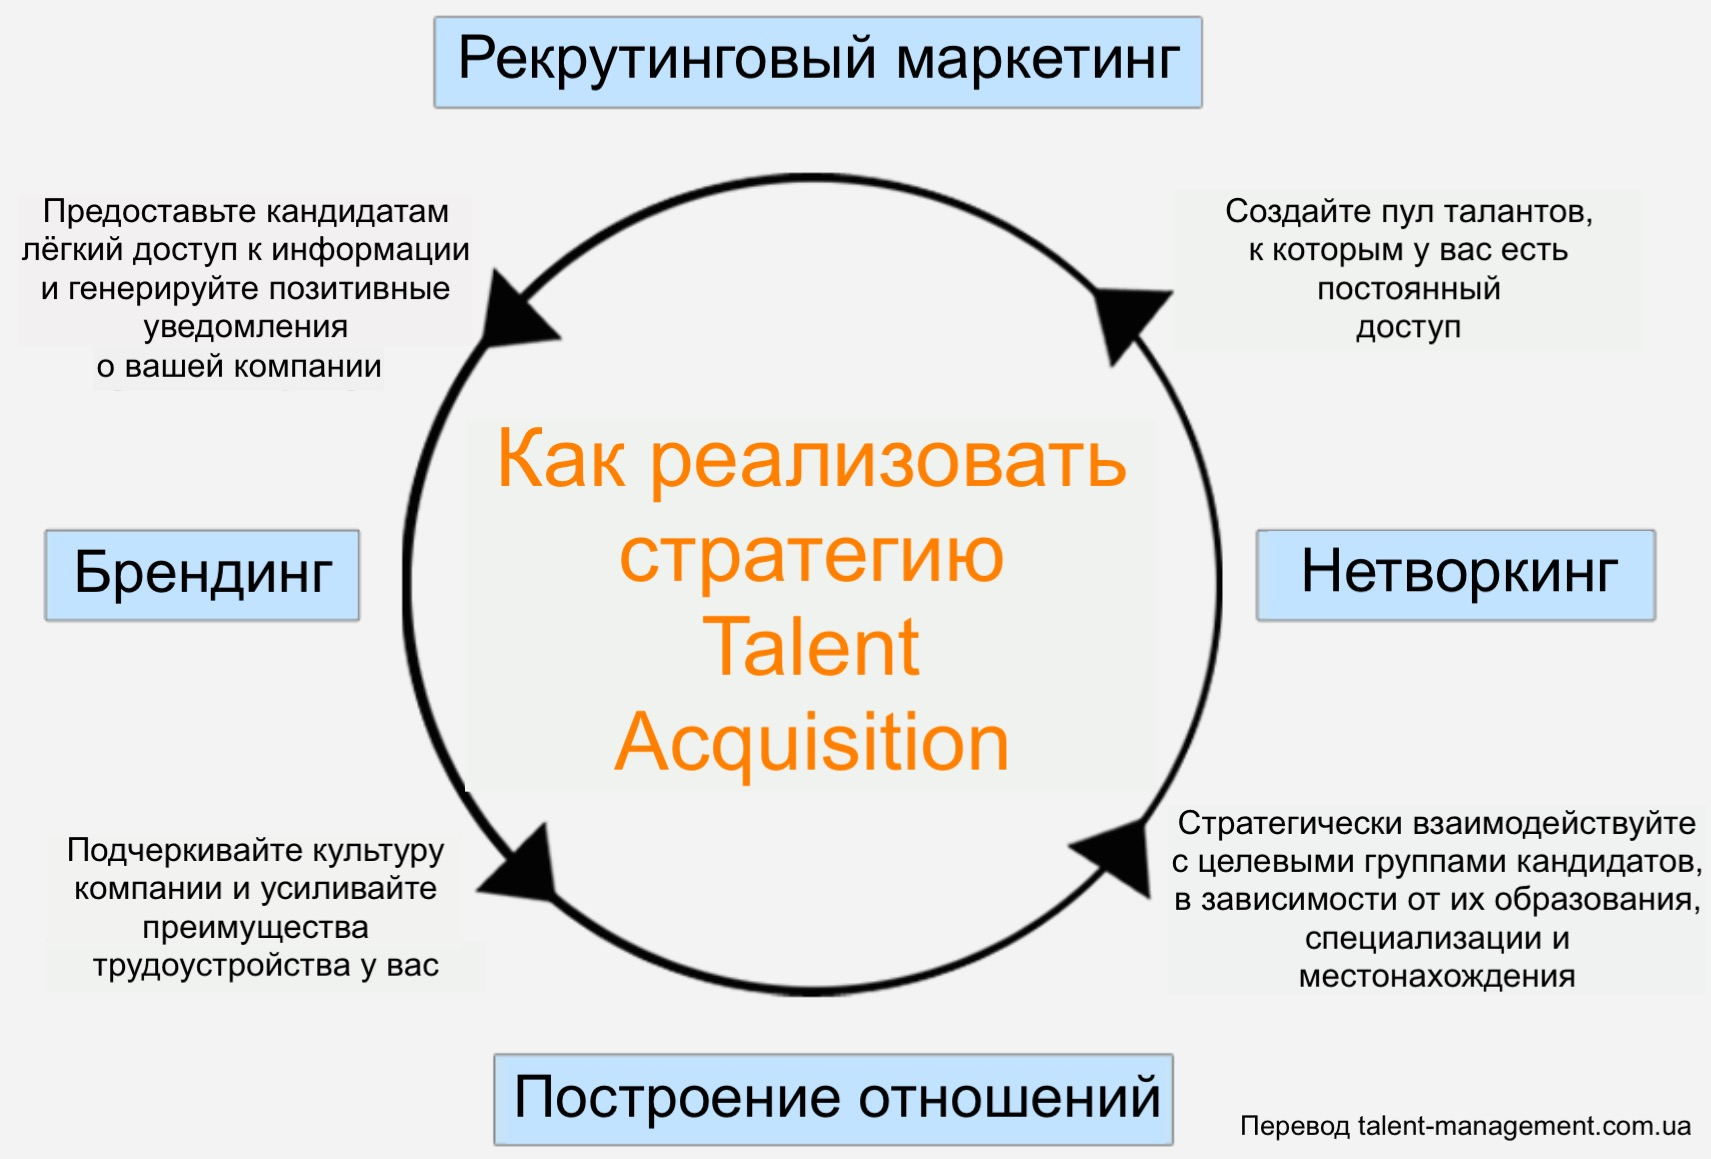 Стратегия Talent Acquisition